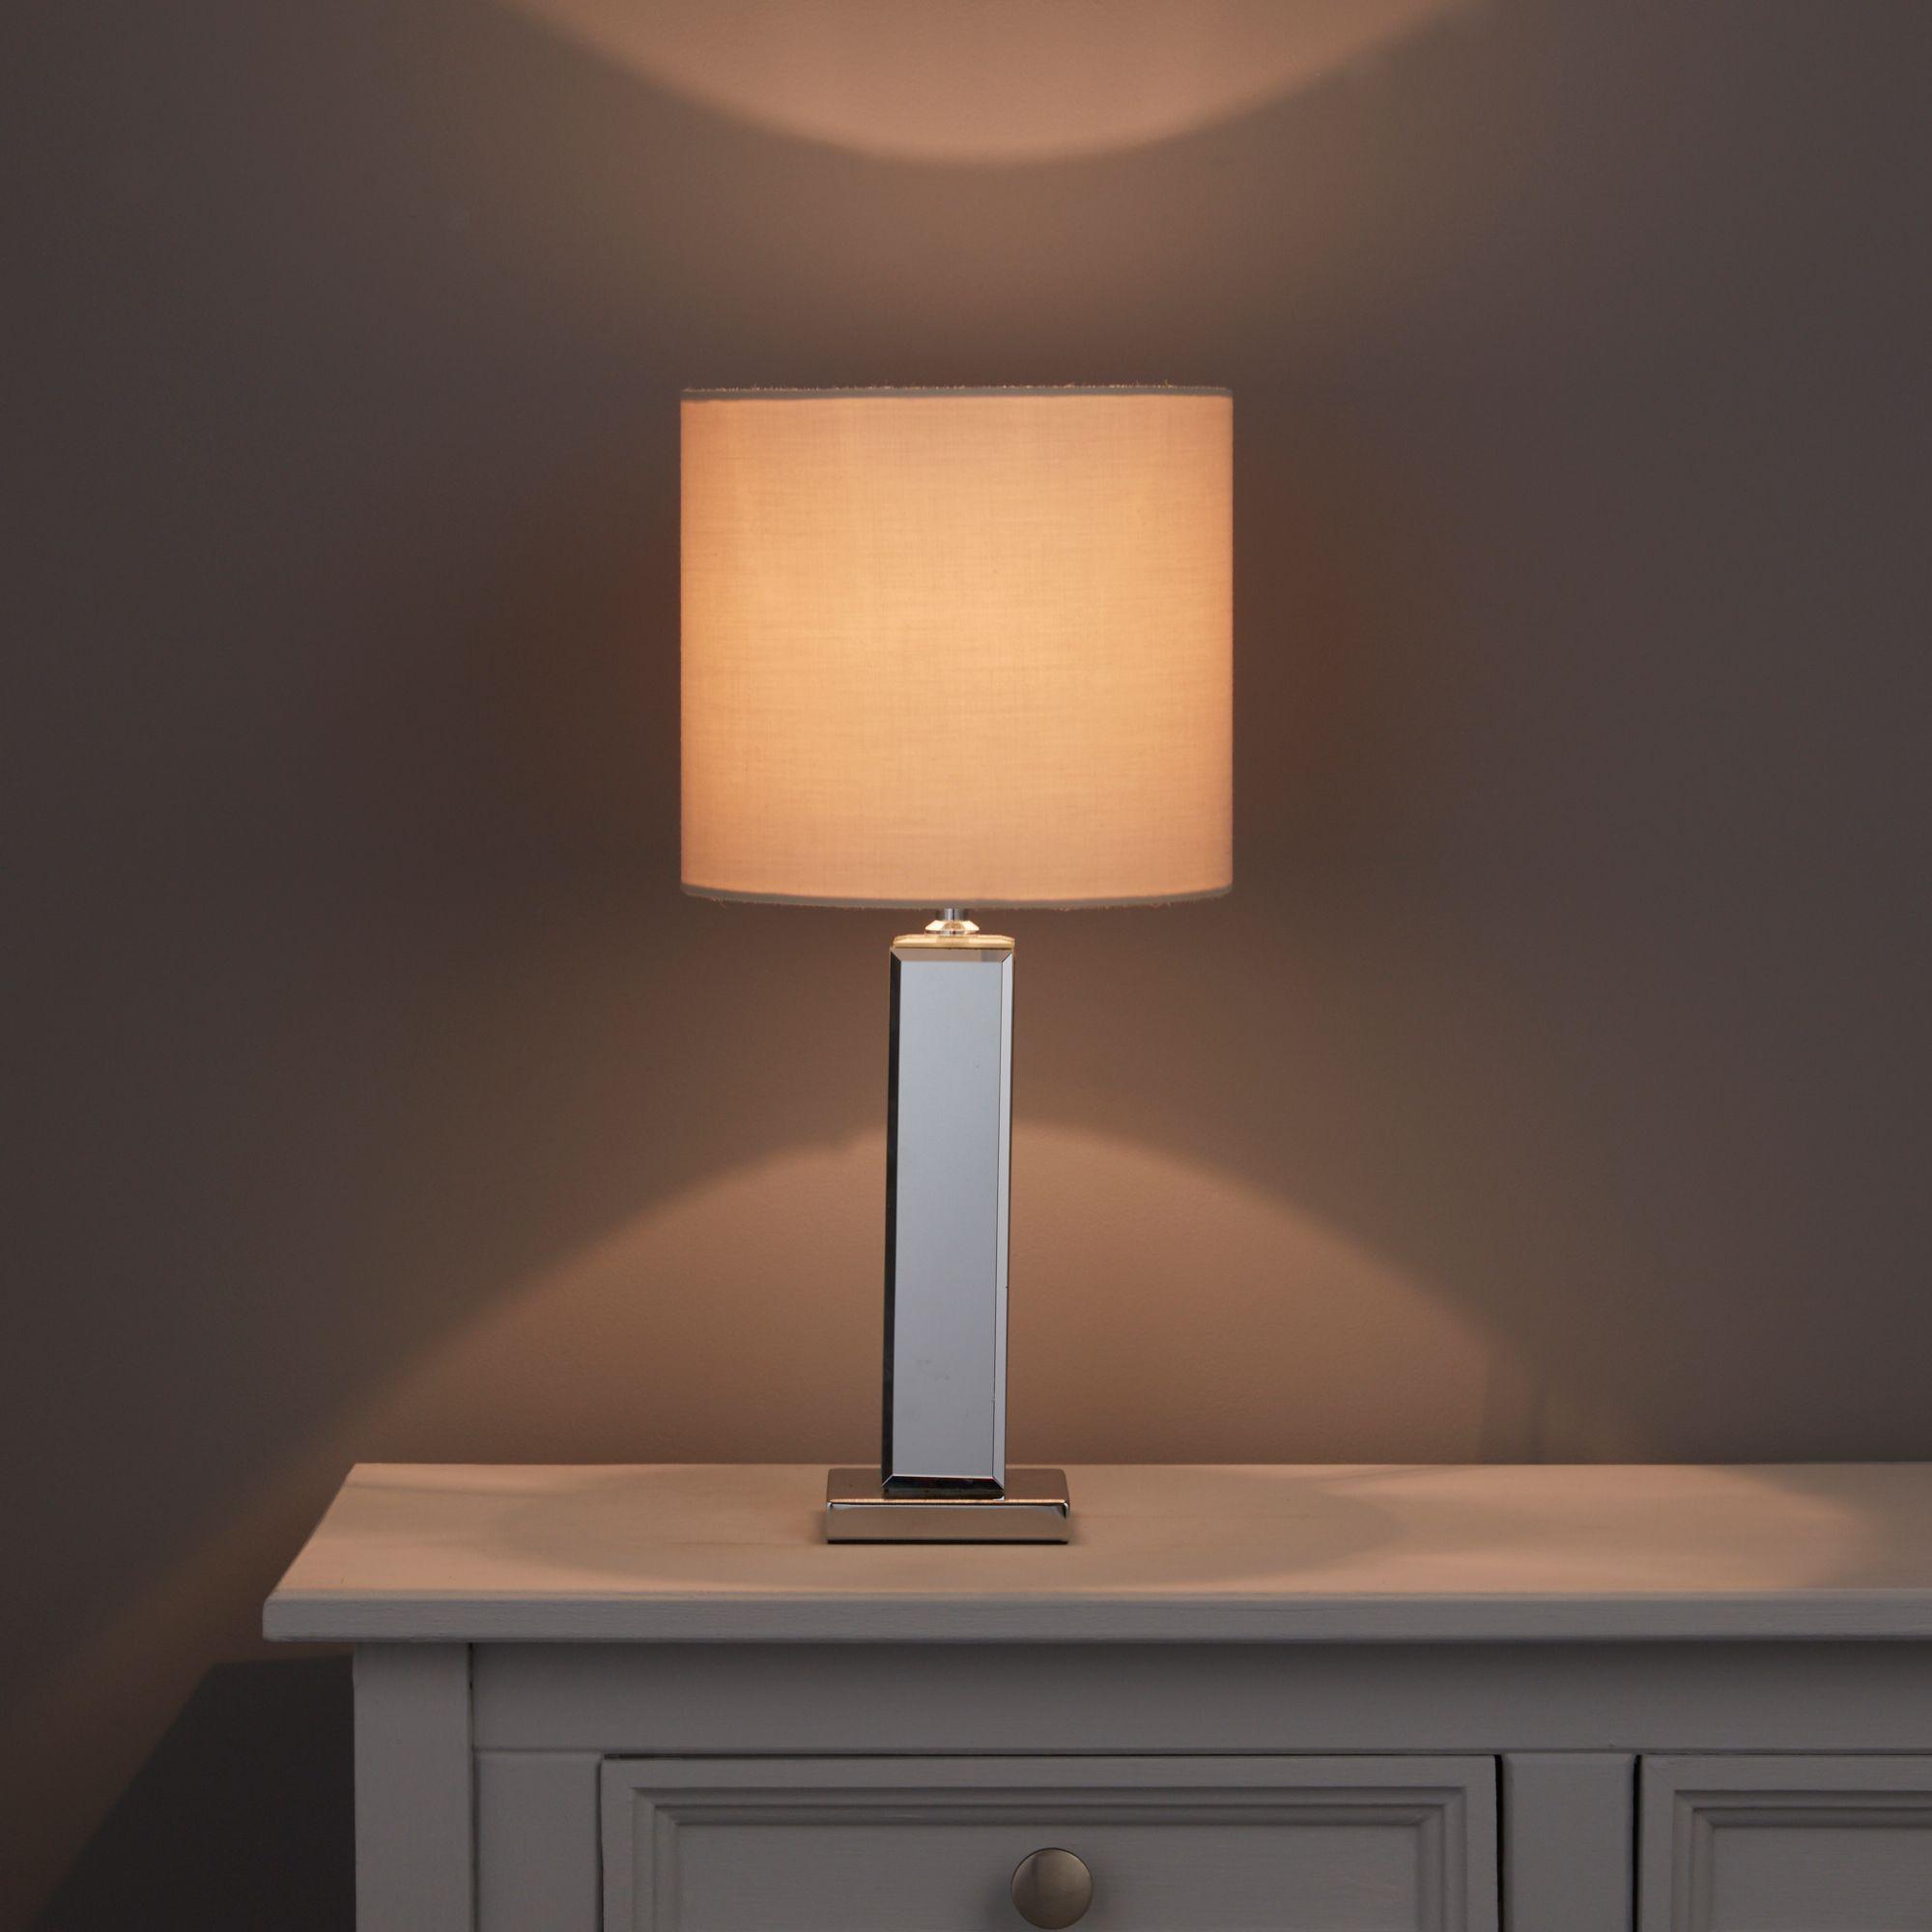 Table lamps desk lamps indoor lighting diy at bq ara mirror table lamp geotapseo Images